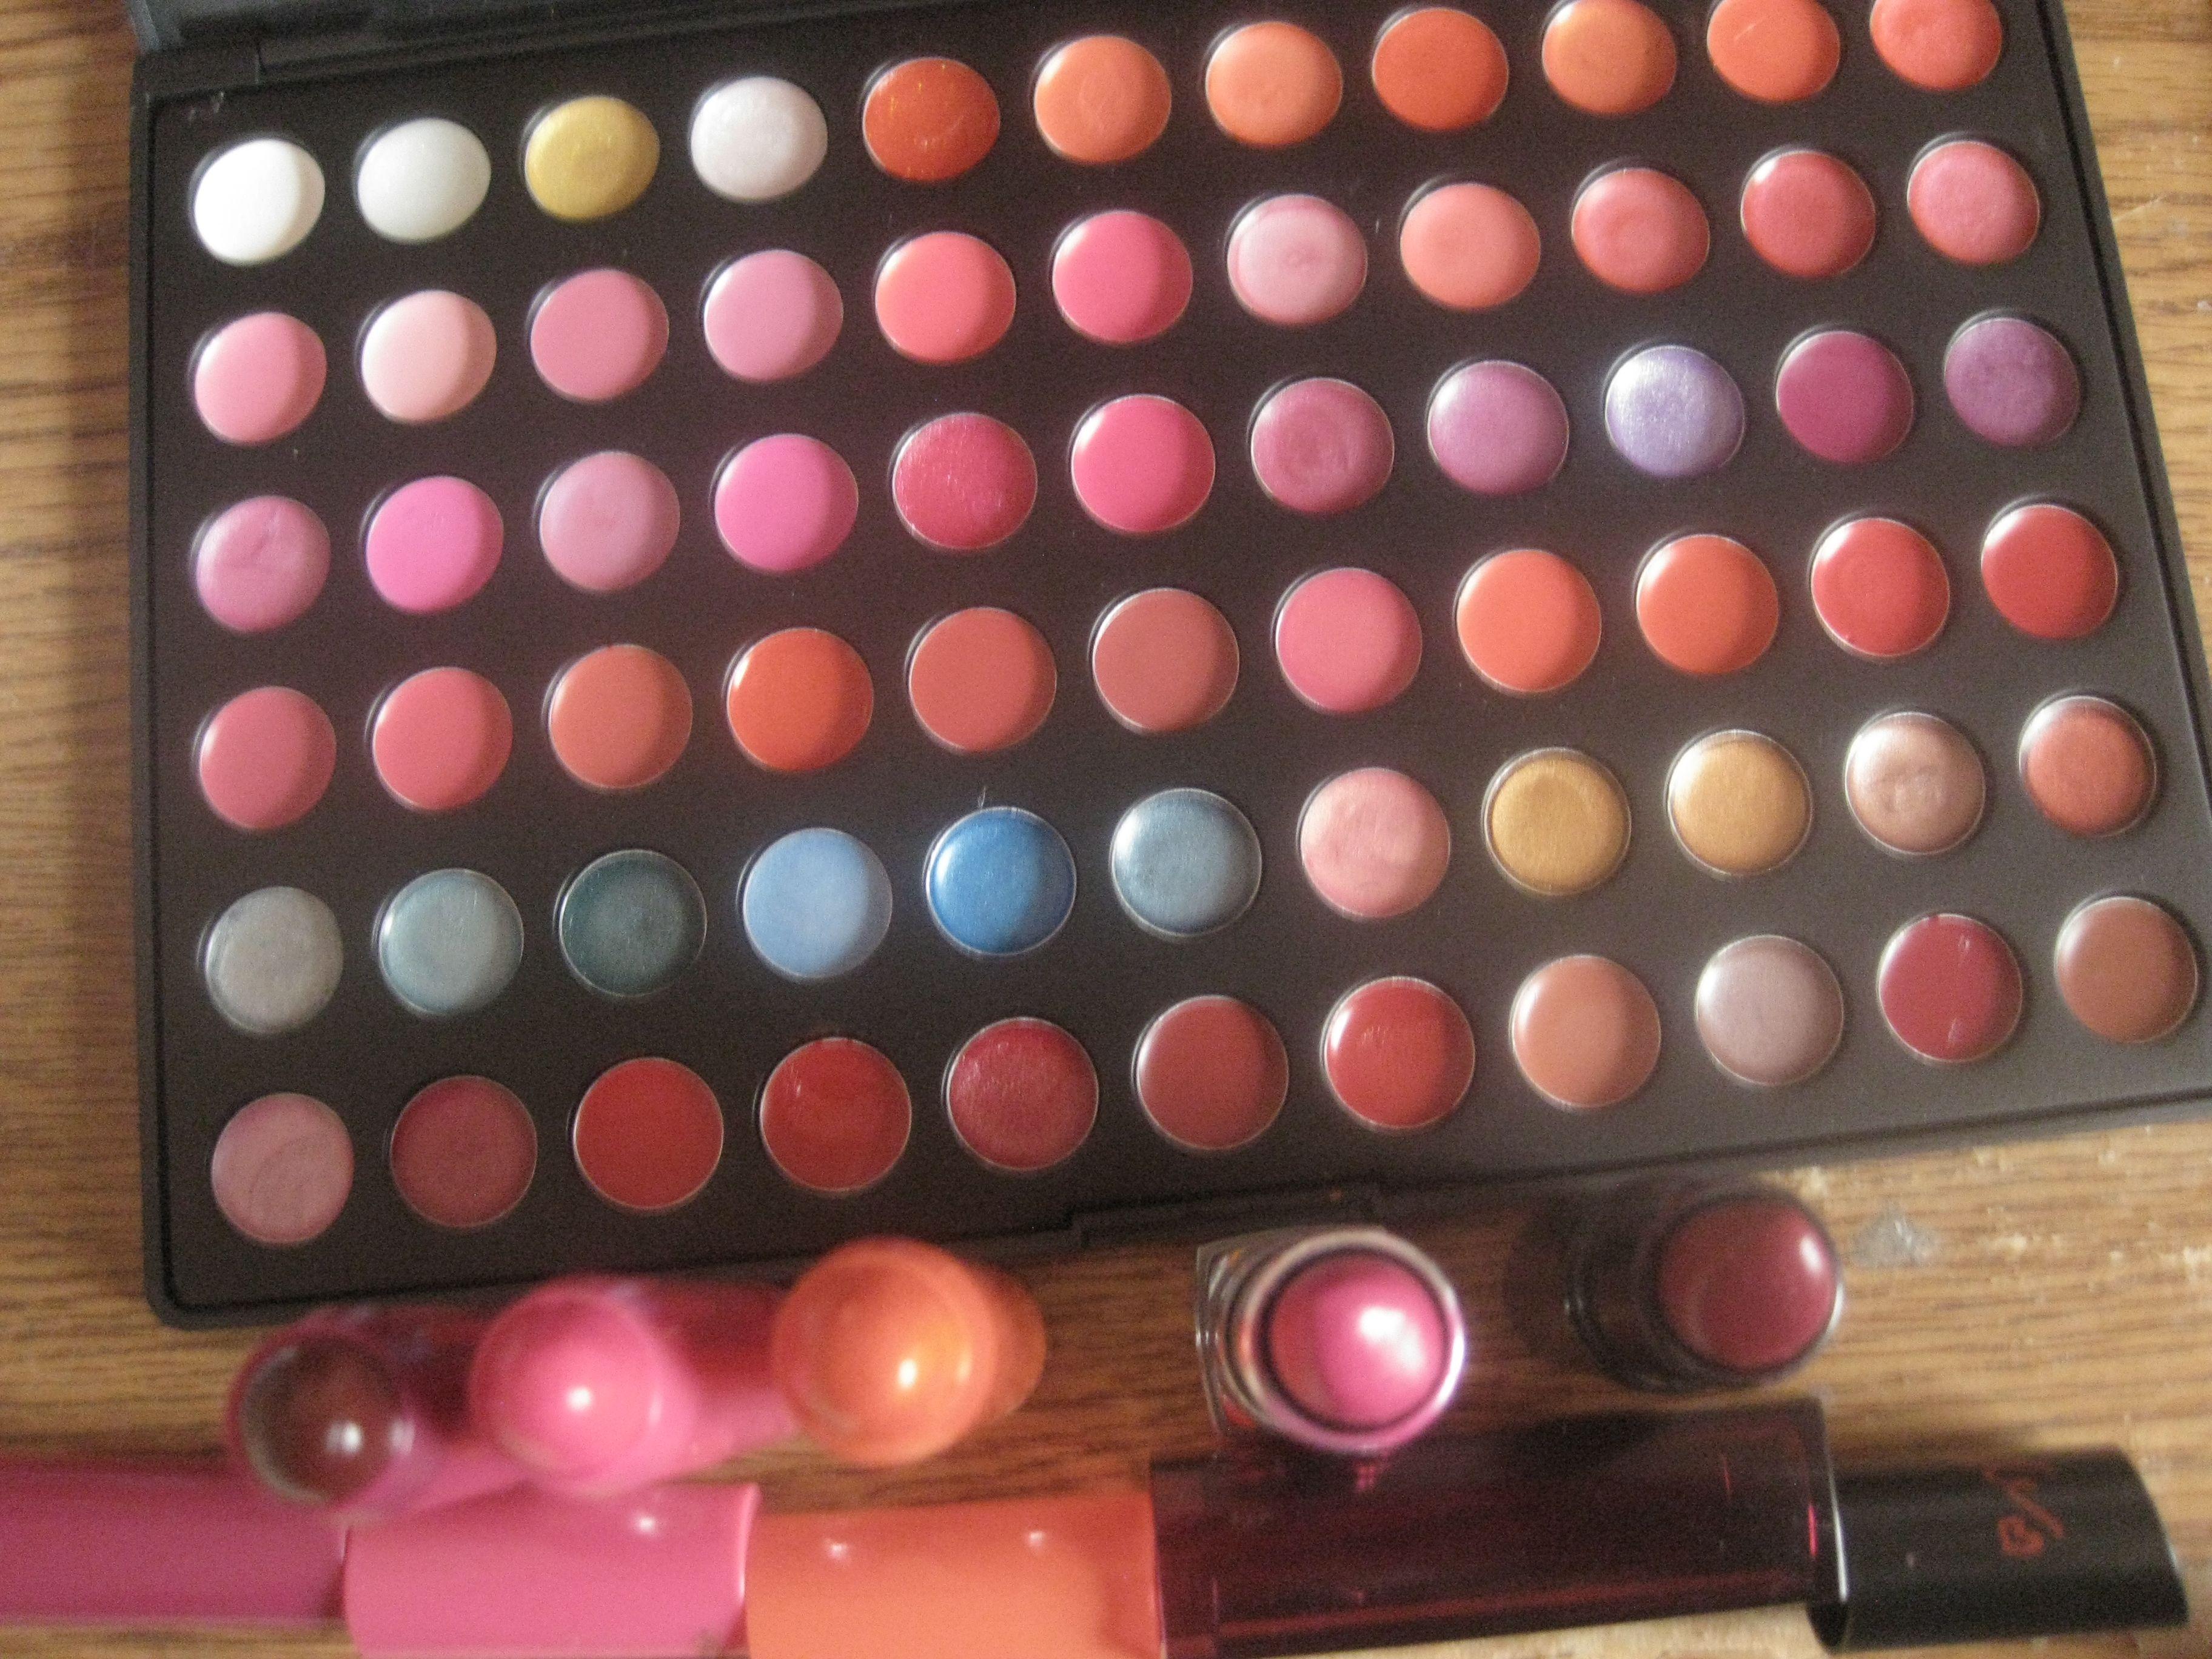 This Week in Lipstick: Revlon, Maybelline, Rimmel, Coastal Scents